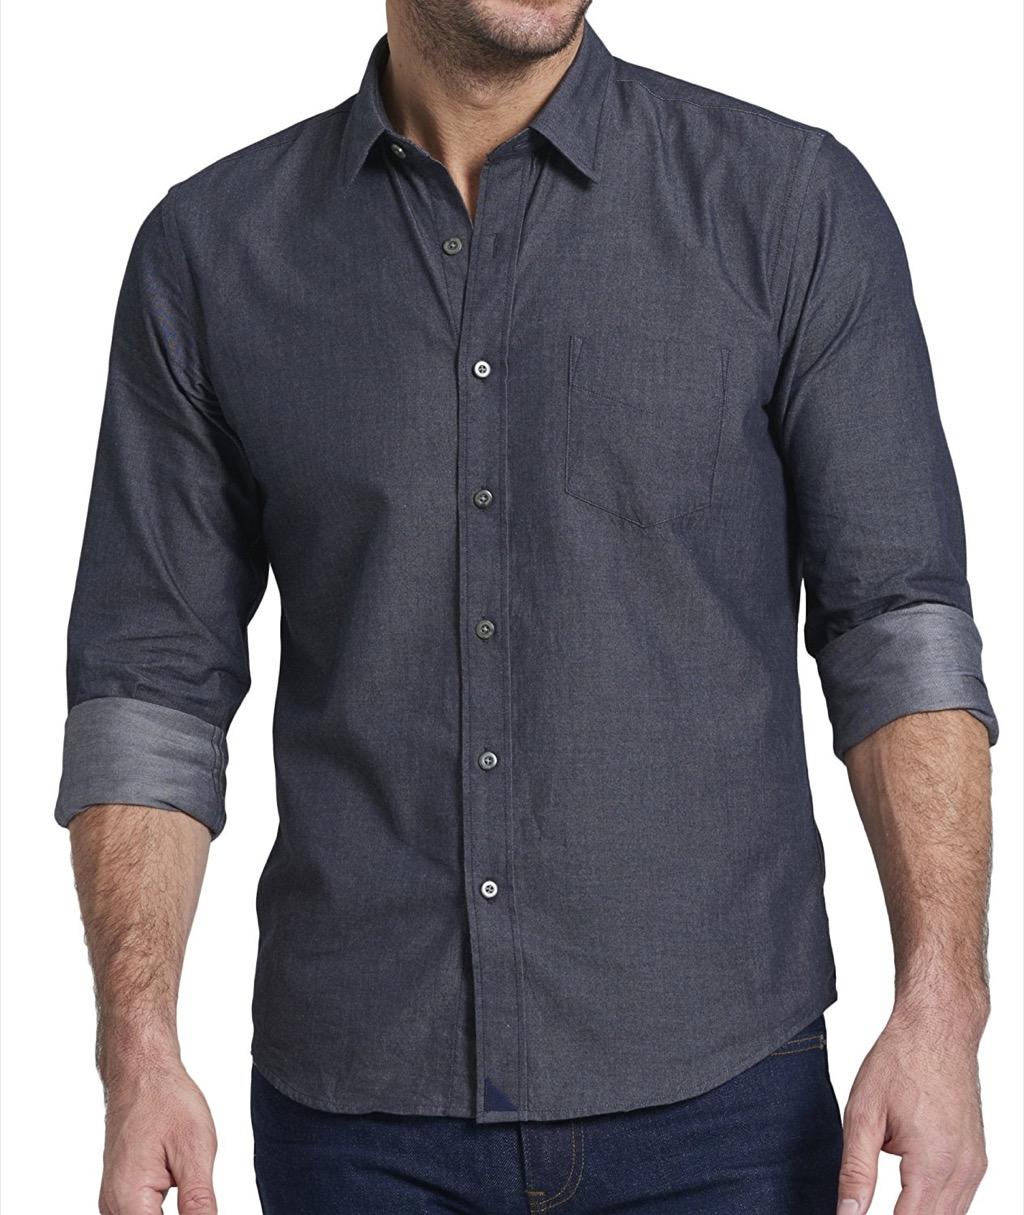 untuckit untucked shirt